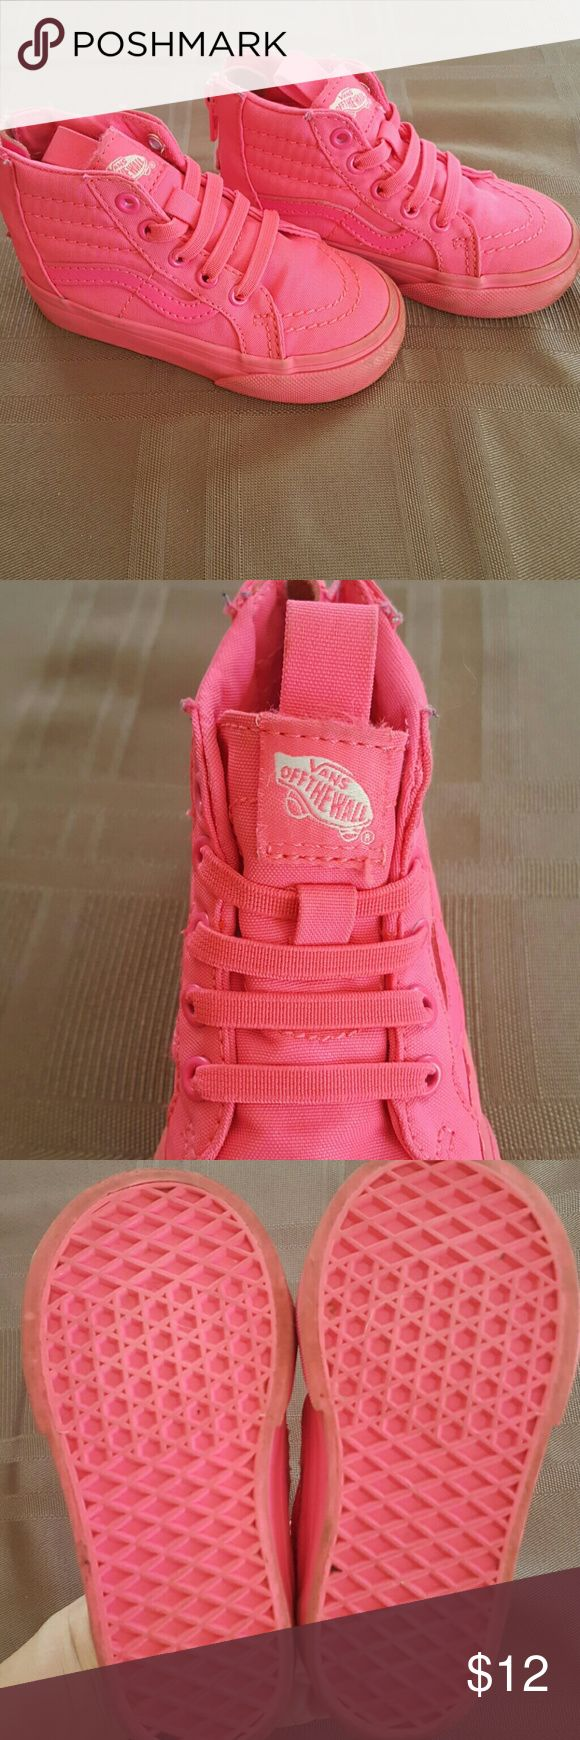 Vans toddler sneakers *LOWEST PRICE* Adorable hot pink Vans. Slip on with zipper on the heel. Vans Shoes Sneakers